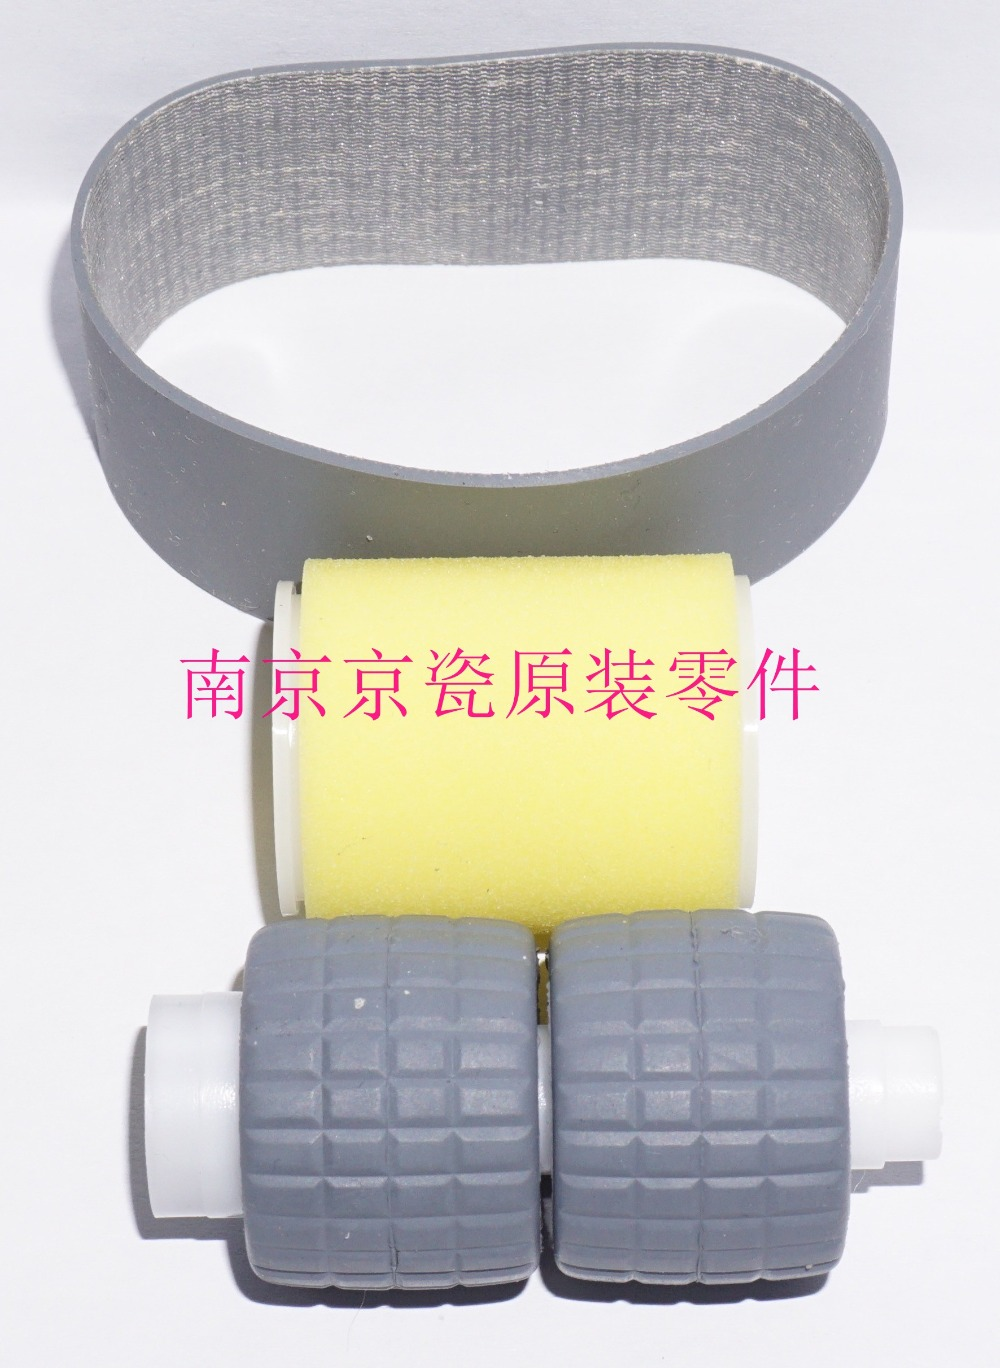 New Original Kyocera 303H607020 303JX07460 303JX07330 POULIE FEED ADF (1 set de 3) pour: KM-3050 4050 5050 DP-700